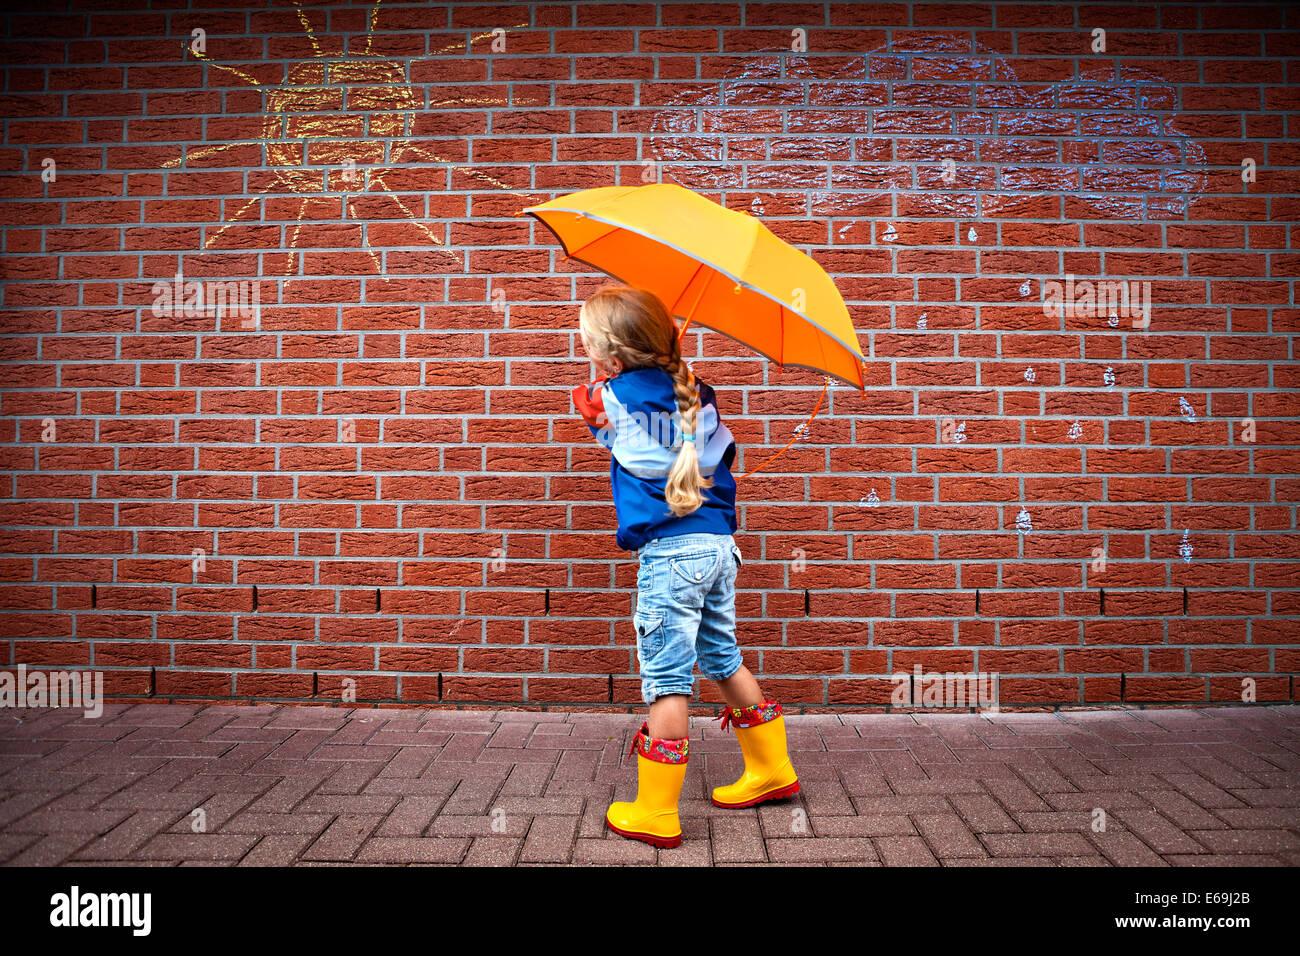 Mädchen, Wetter, Regenschutz Stockbild